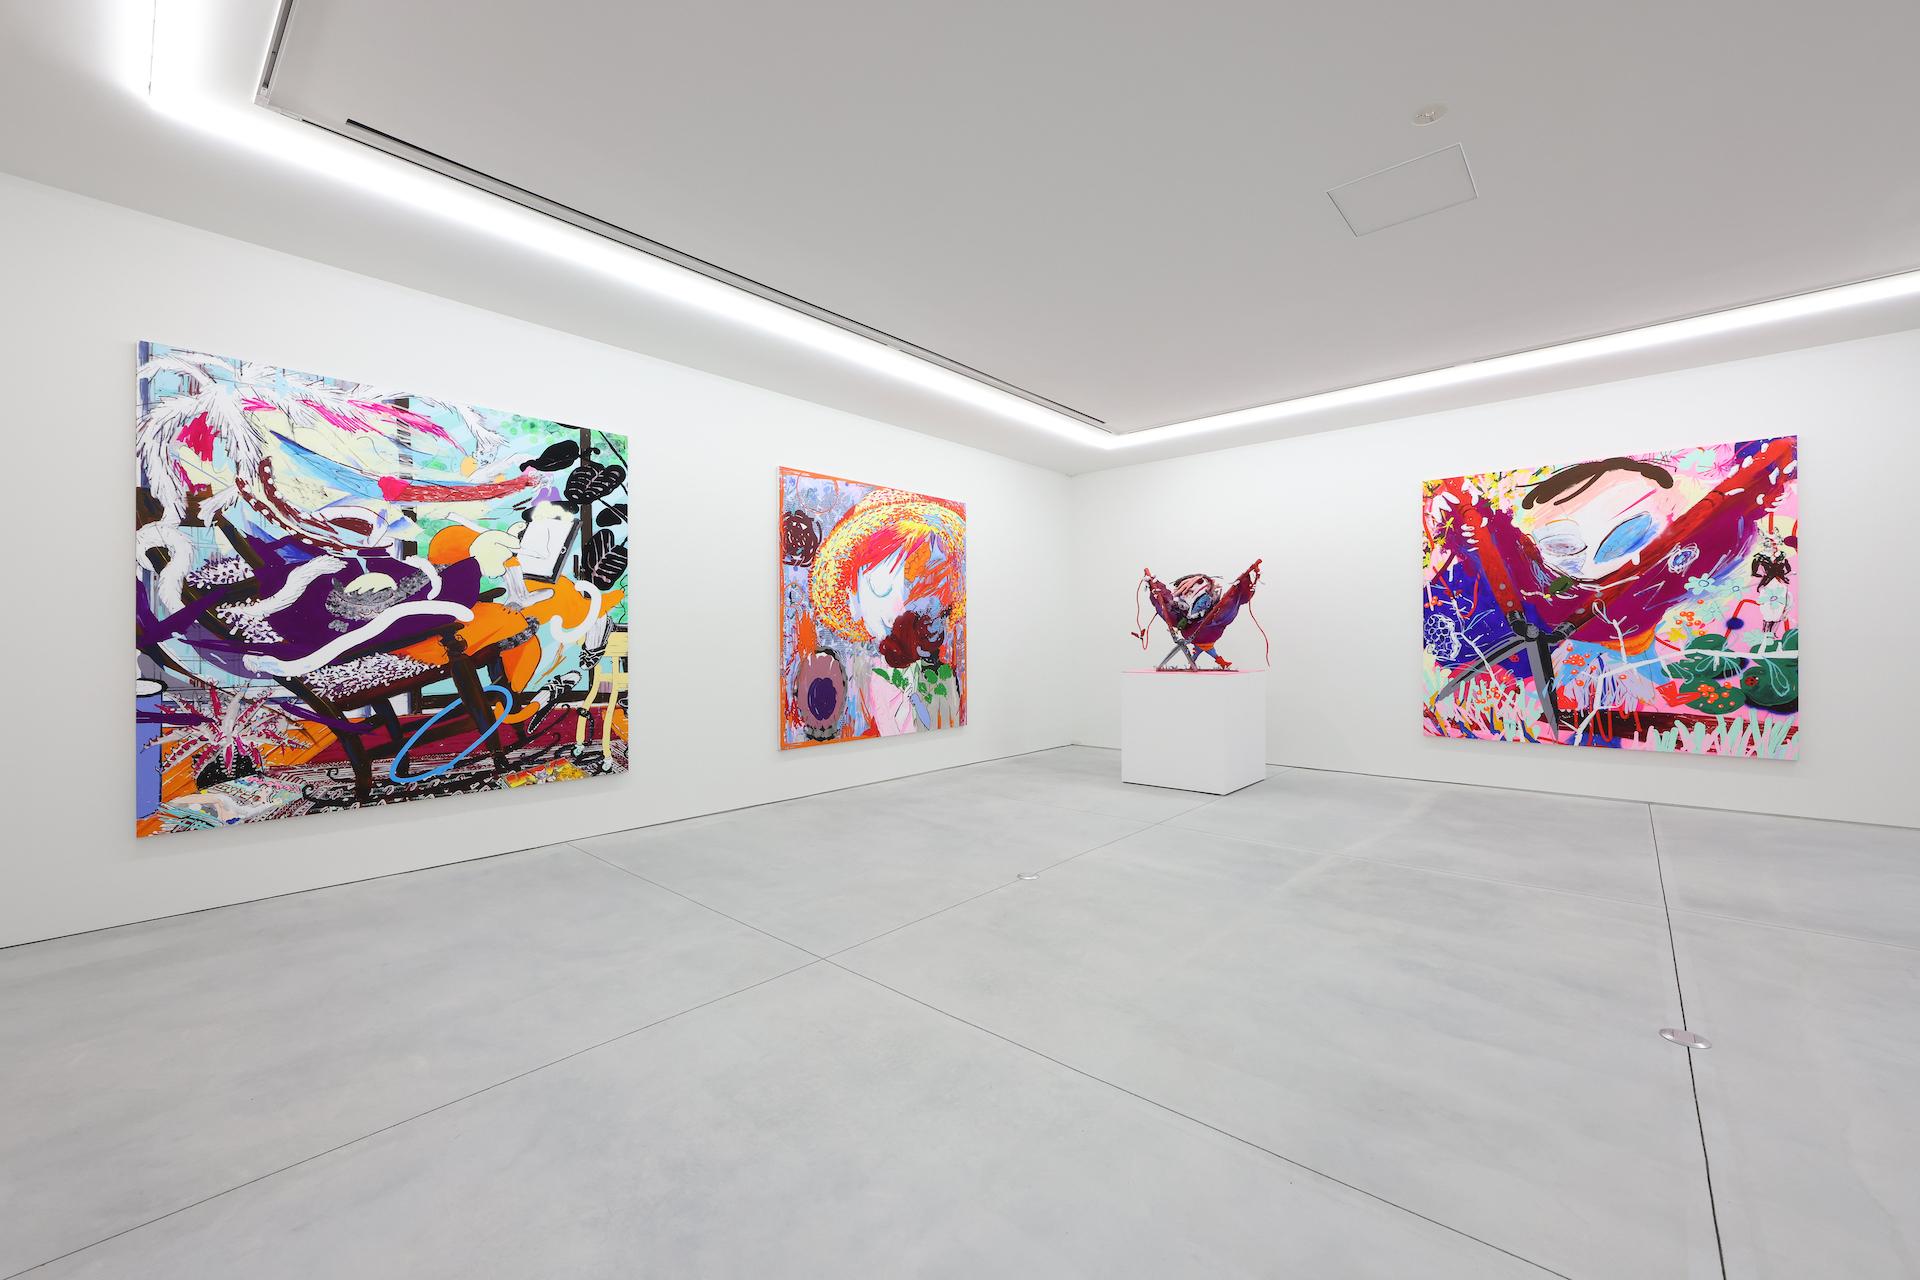 Masato Mori solo exhibition Lonsdaleite Year, NANZUKA UNDERGROUND, Tokyo, 2021 ©Masato Mori Courtesy of NANZUKA